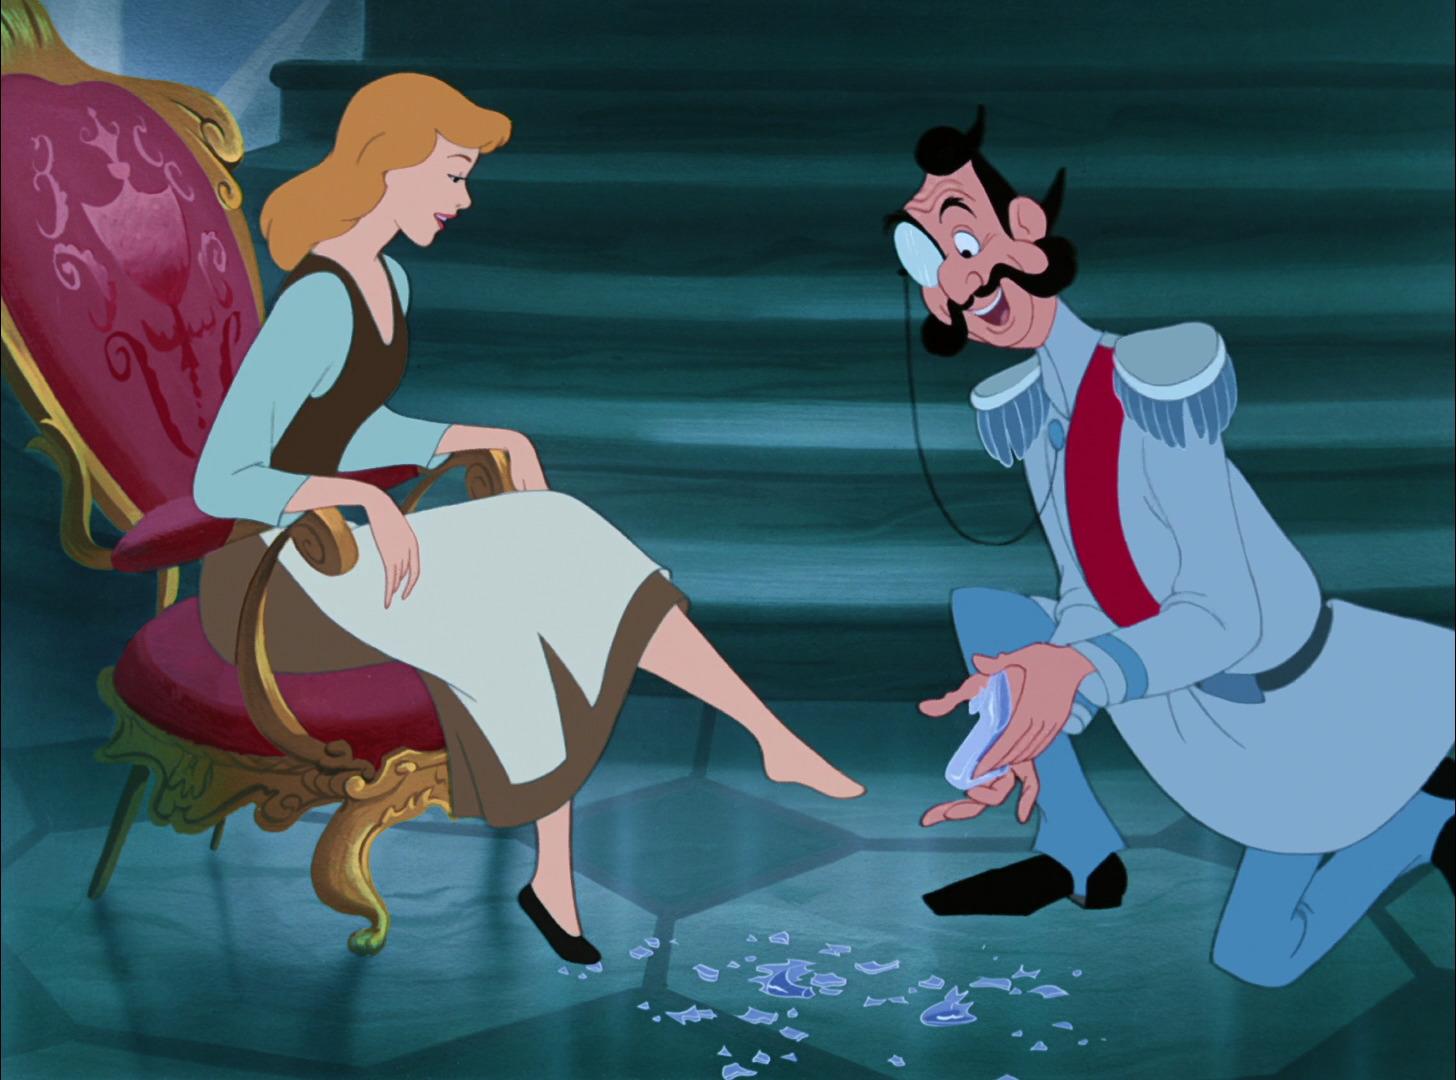 File:Cinderella4.jpg